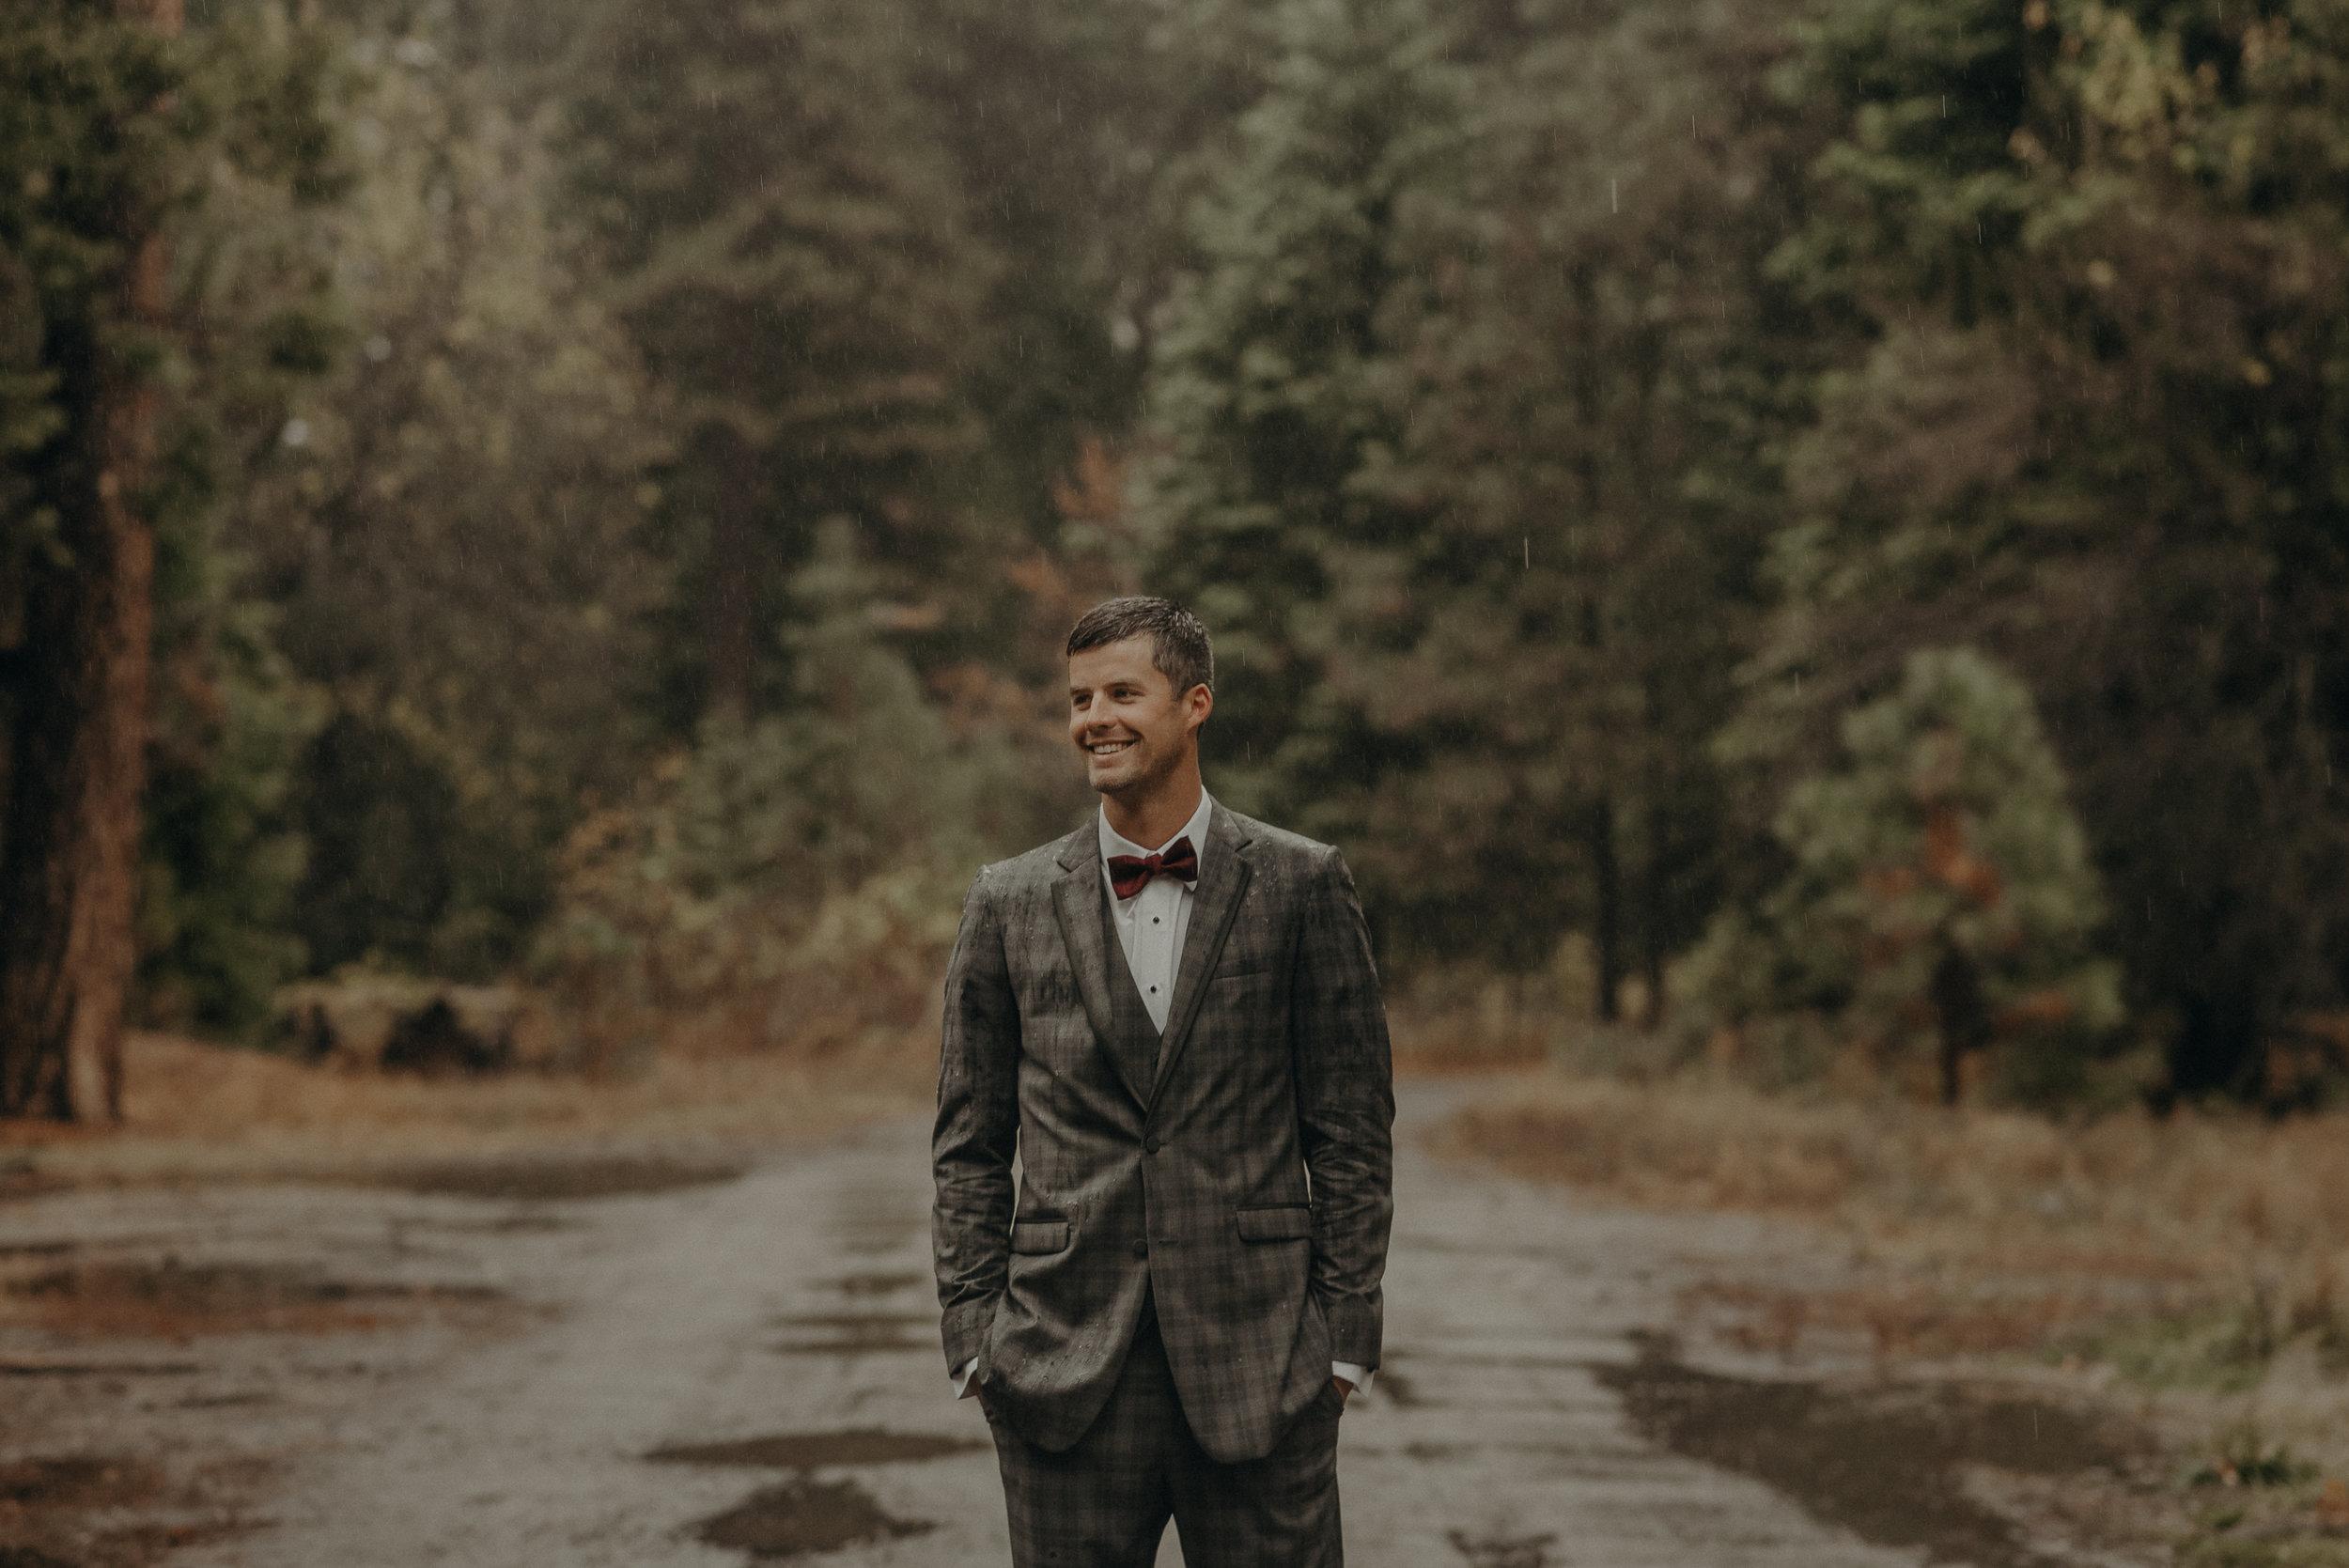 Isaiah + Taylor Photography - Yosemite Elopement - Los Angeles Wedding Photographer-5.jpg